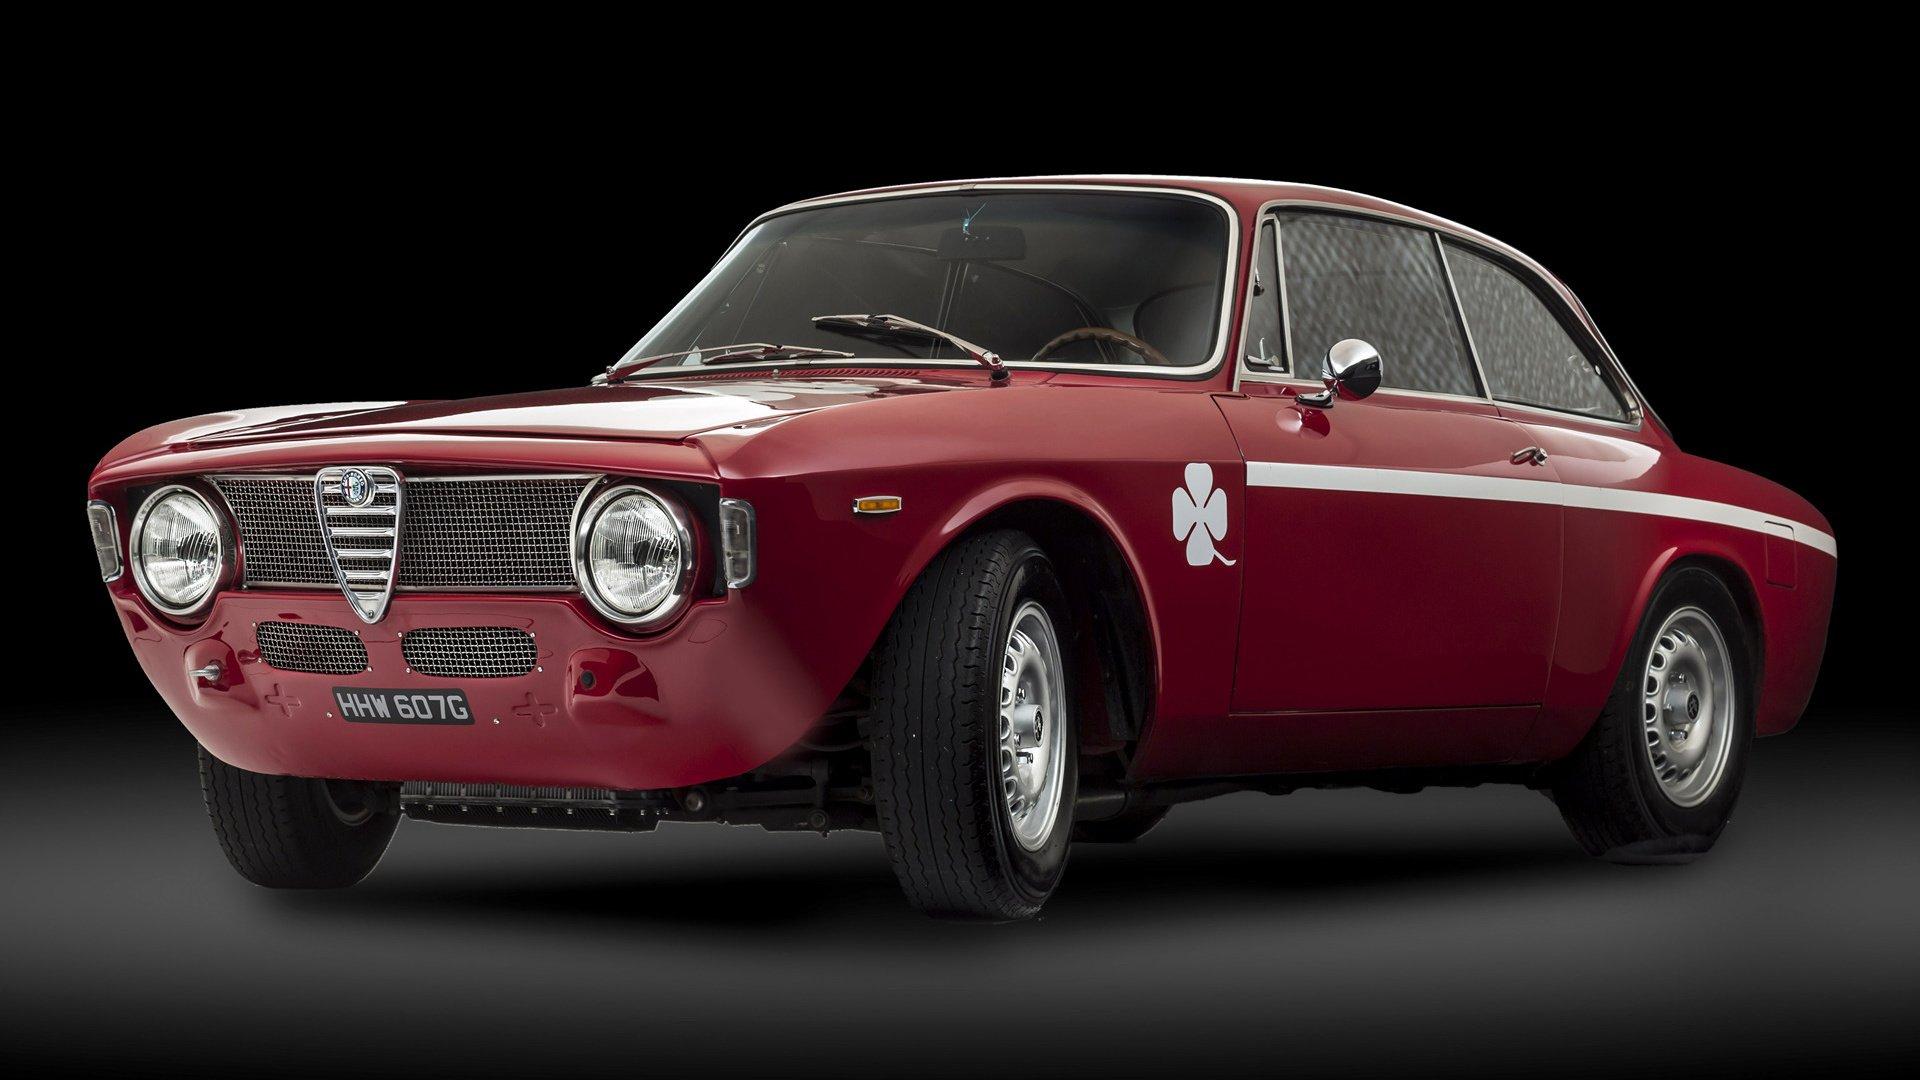 1968 Alfa Romeo Gta 1300 Junior Hd Wallpaper Background Image 1920x1080 Id 960415 Wallpaper Abyss